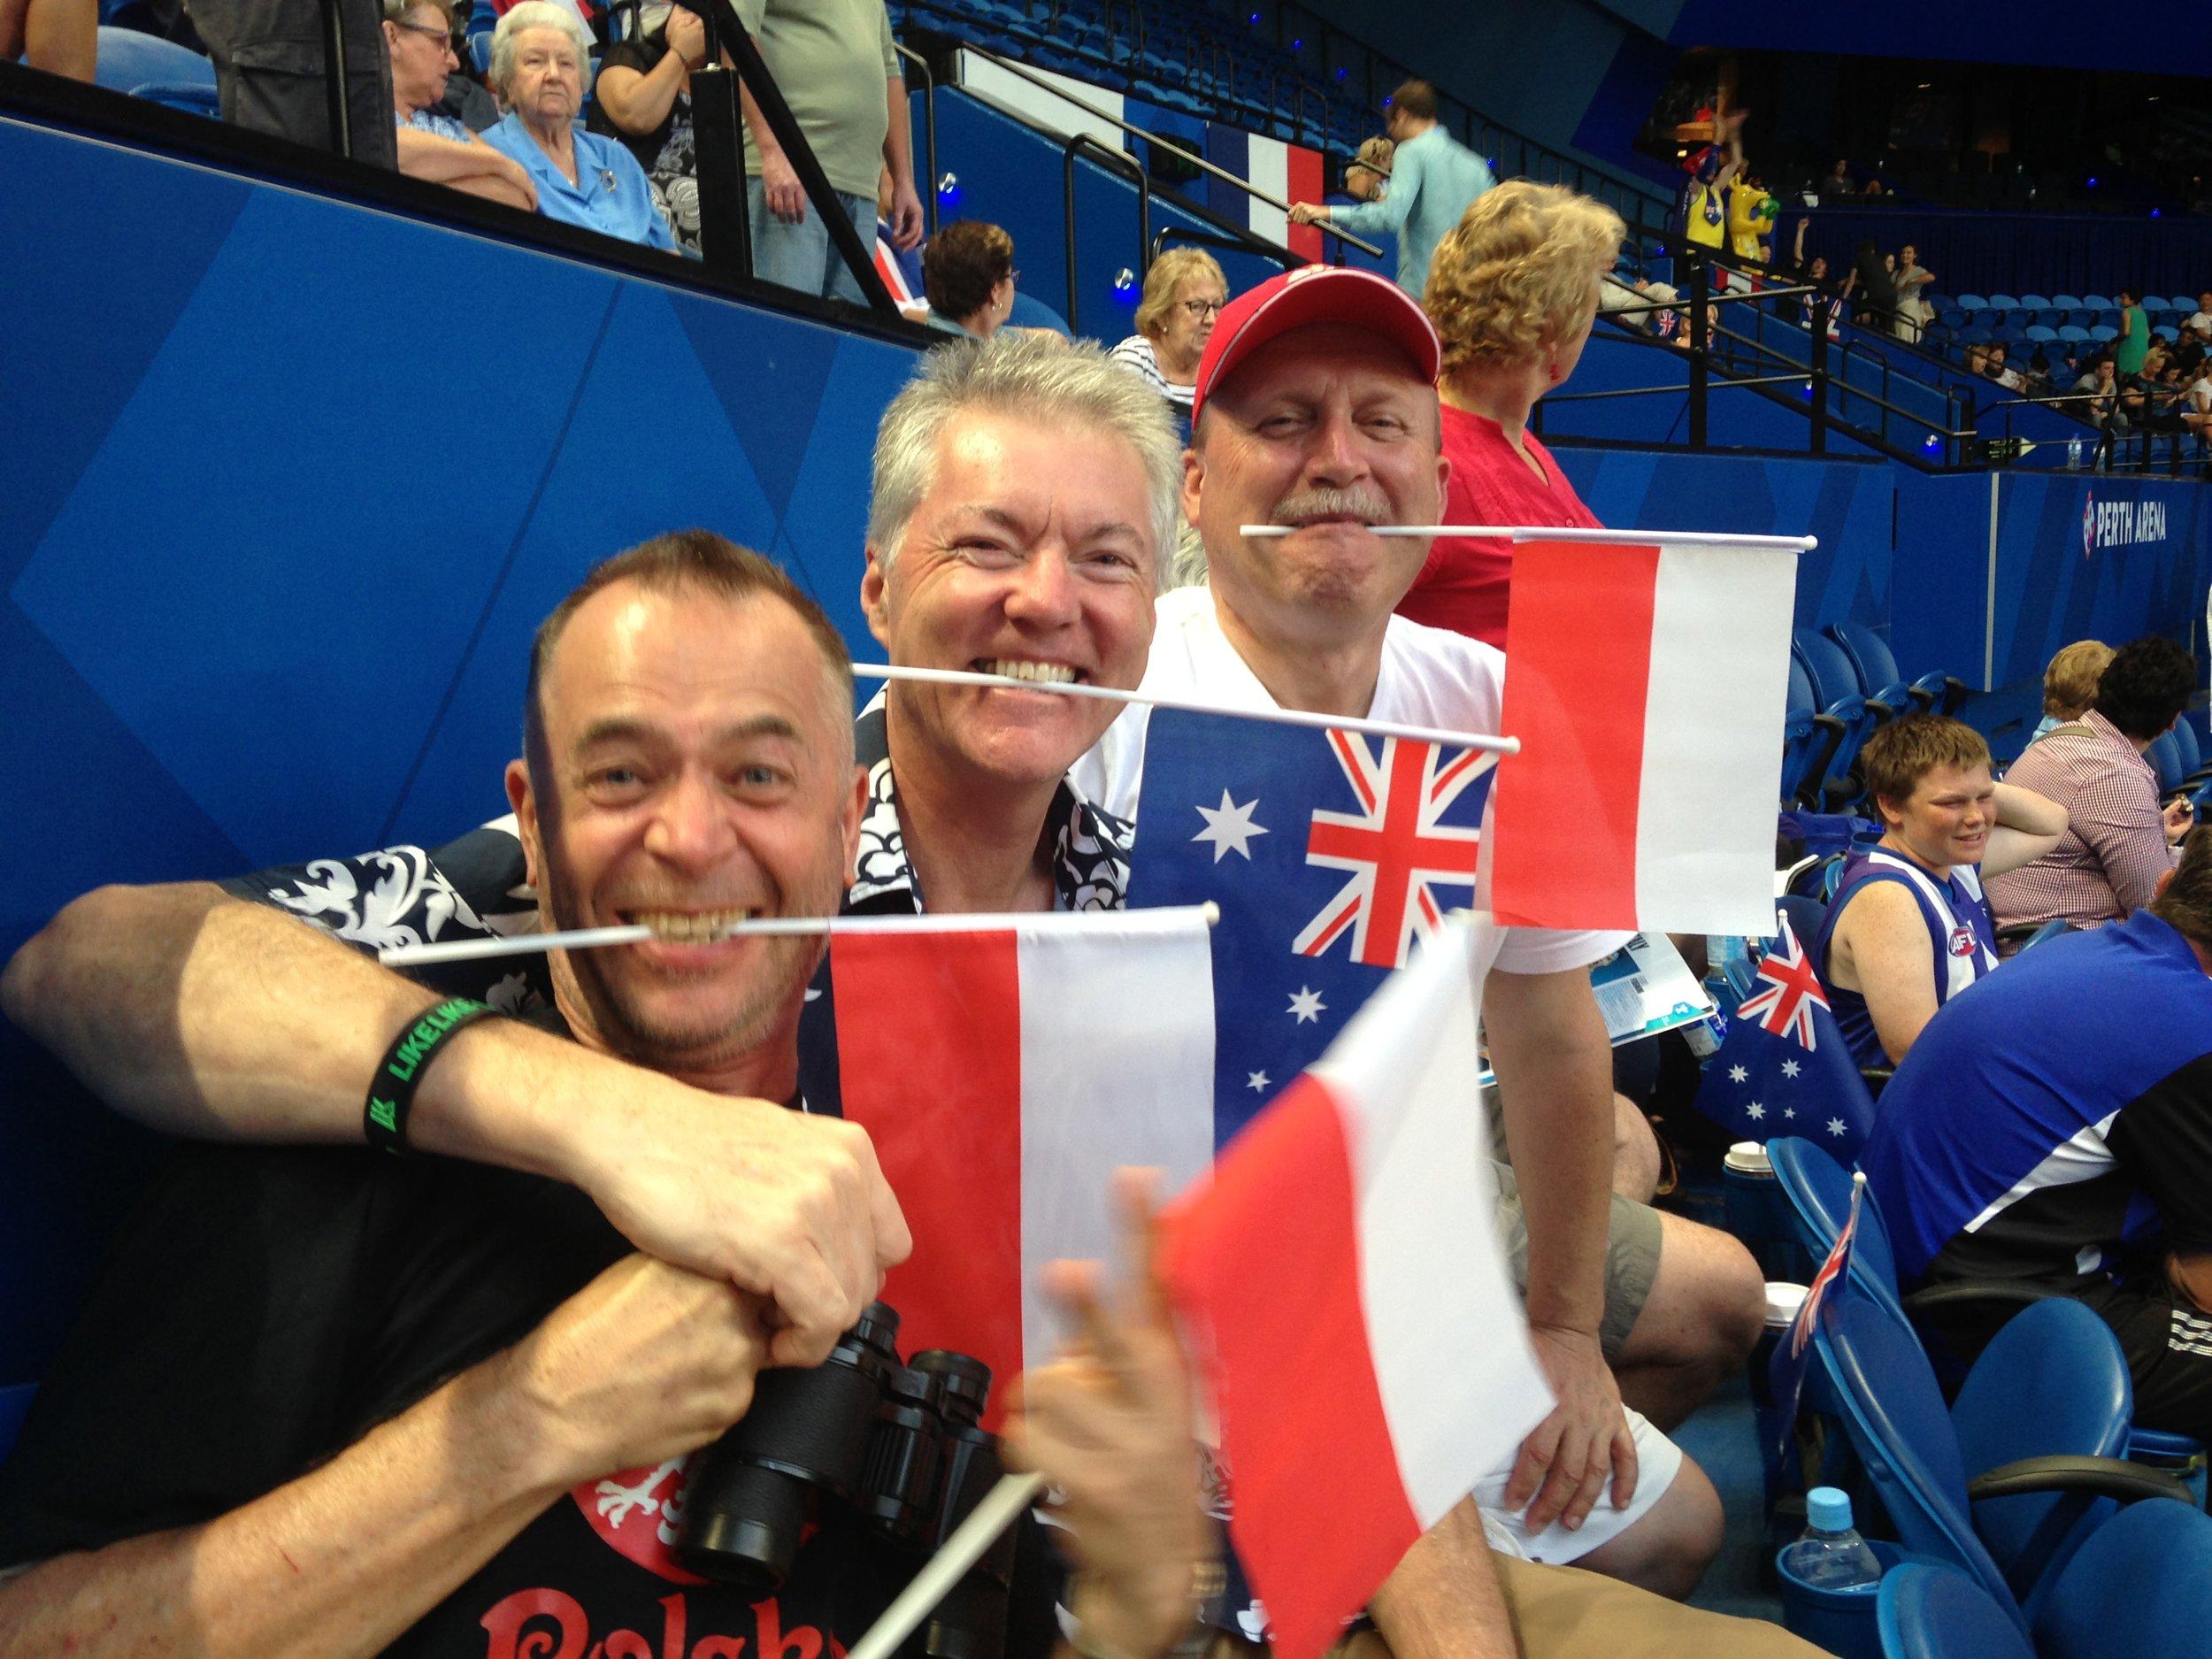 Sometimes if I'm not following the Irish team I go for the Polish team !!!  IMG_2338.JPG